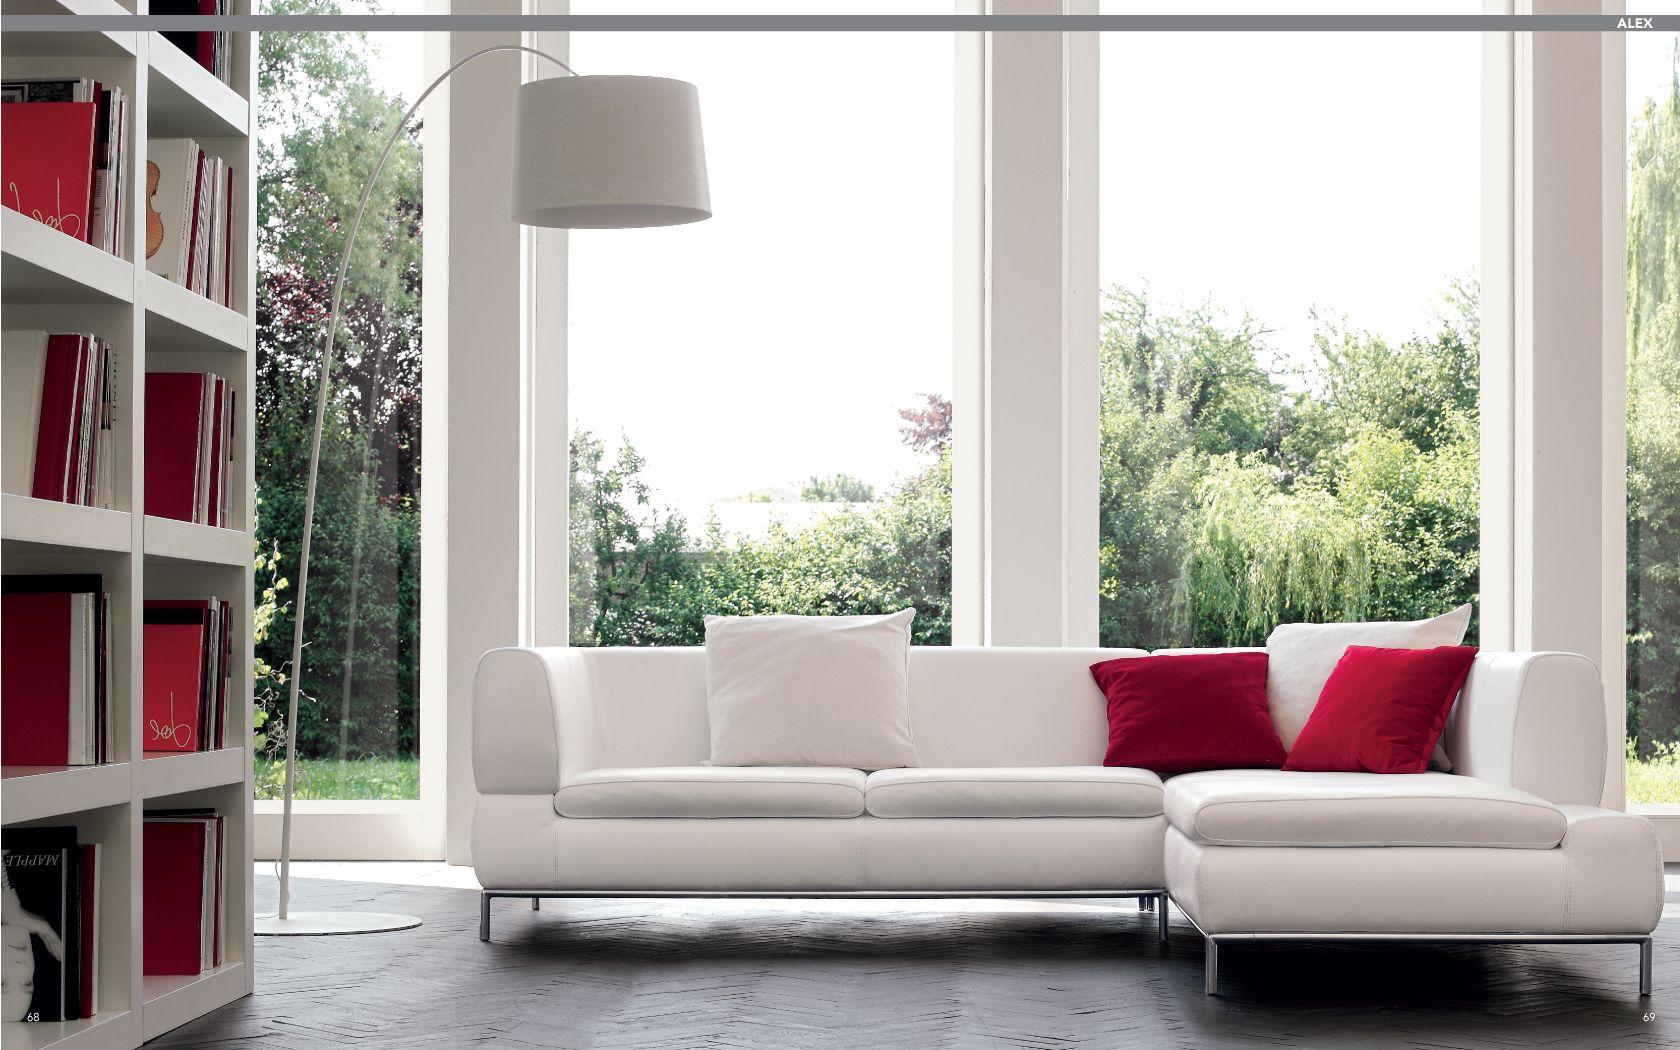 charming modern furniture living room corner fabric sofa sectional mcno422 | Beautiful Nicoline sectional sofa. | Sectional sofa ...